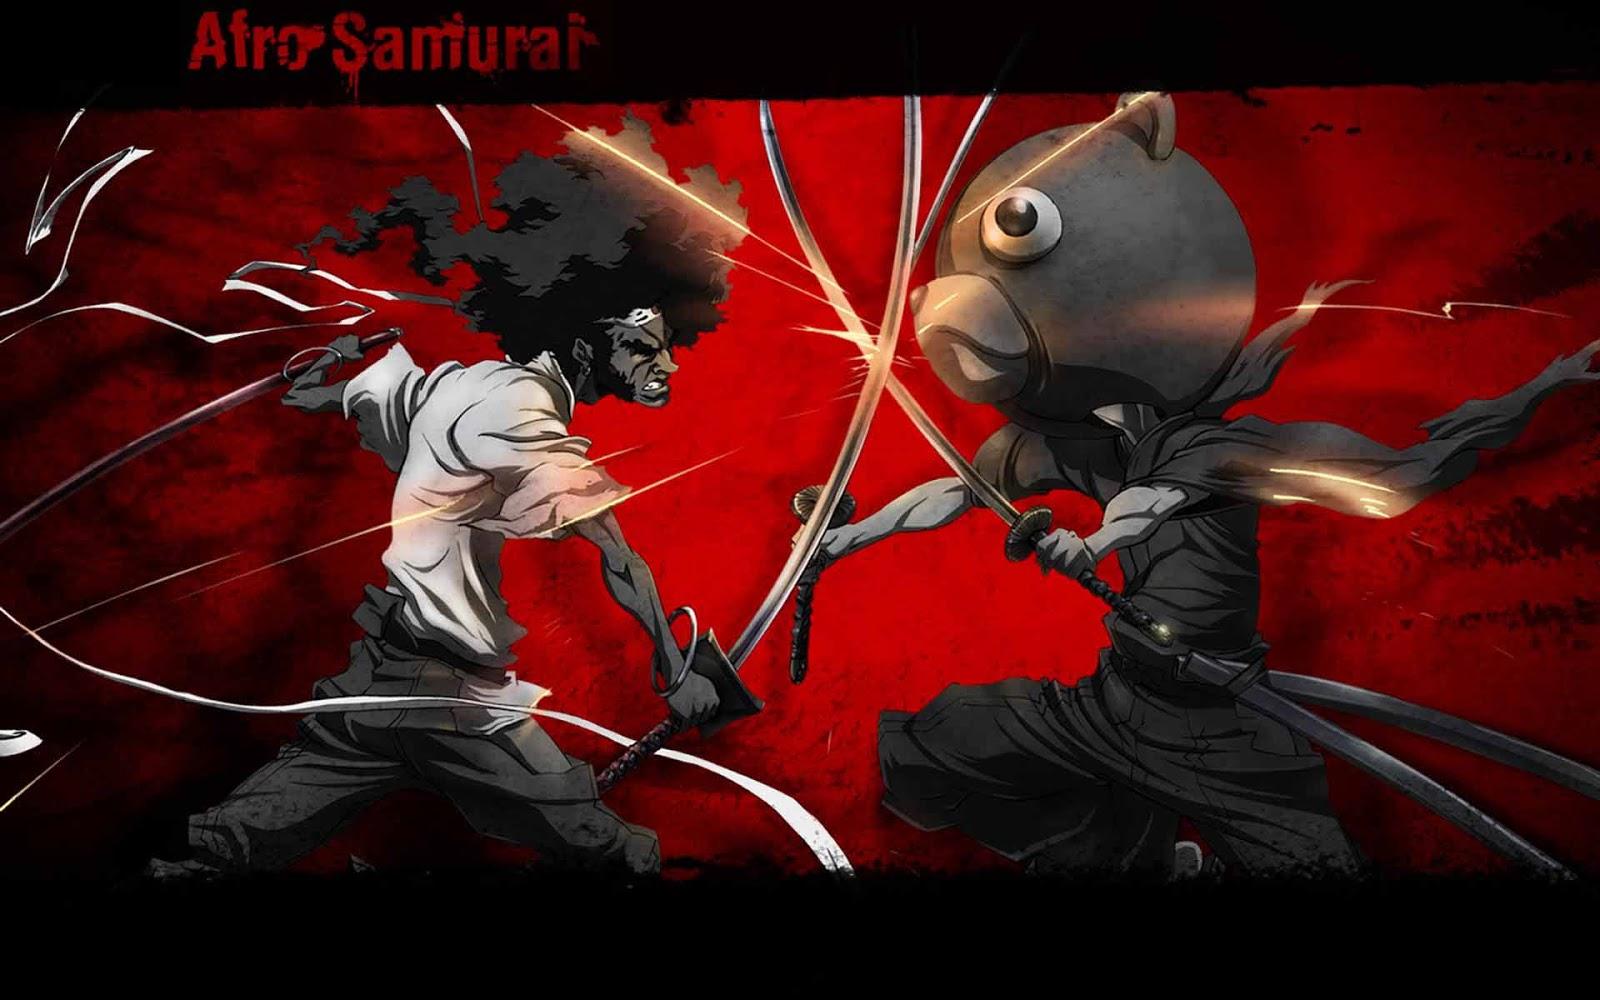 Hd Wallpapers Blog: Afro Samurai Wallpapers